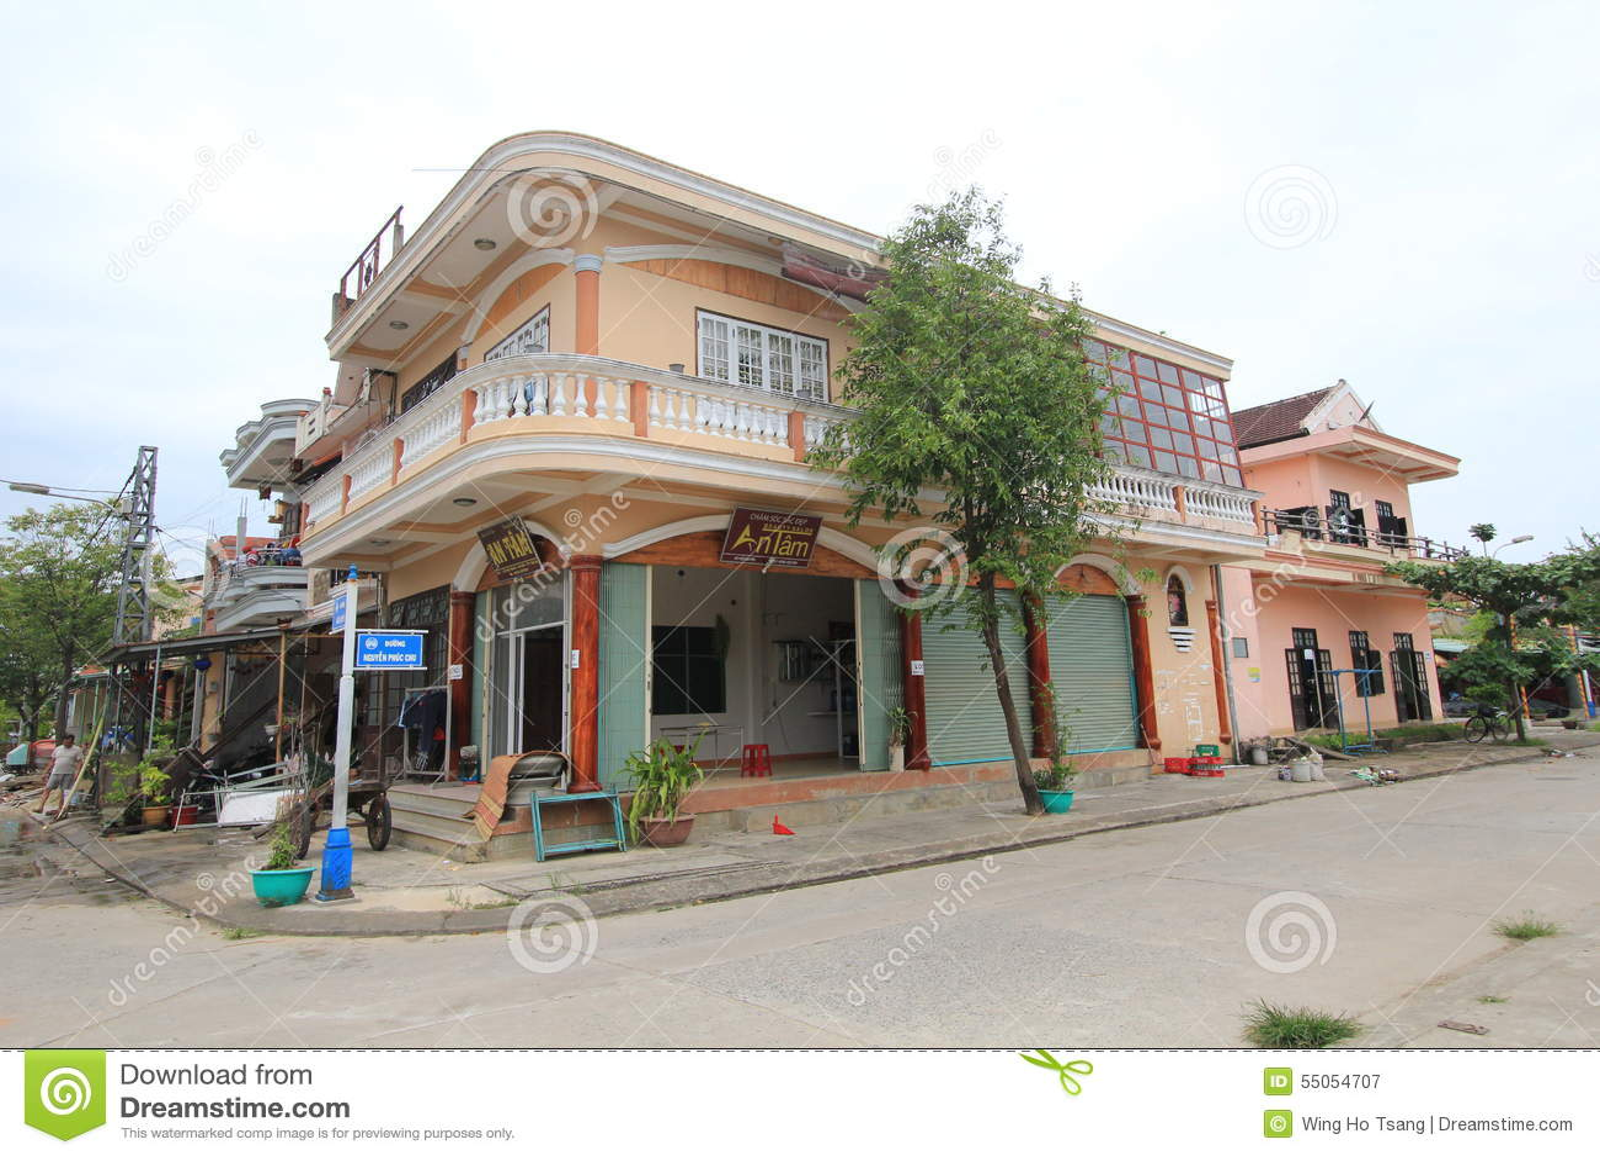 Vietname Hoi An street view